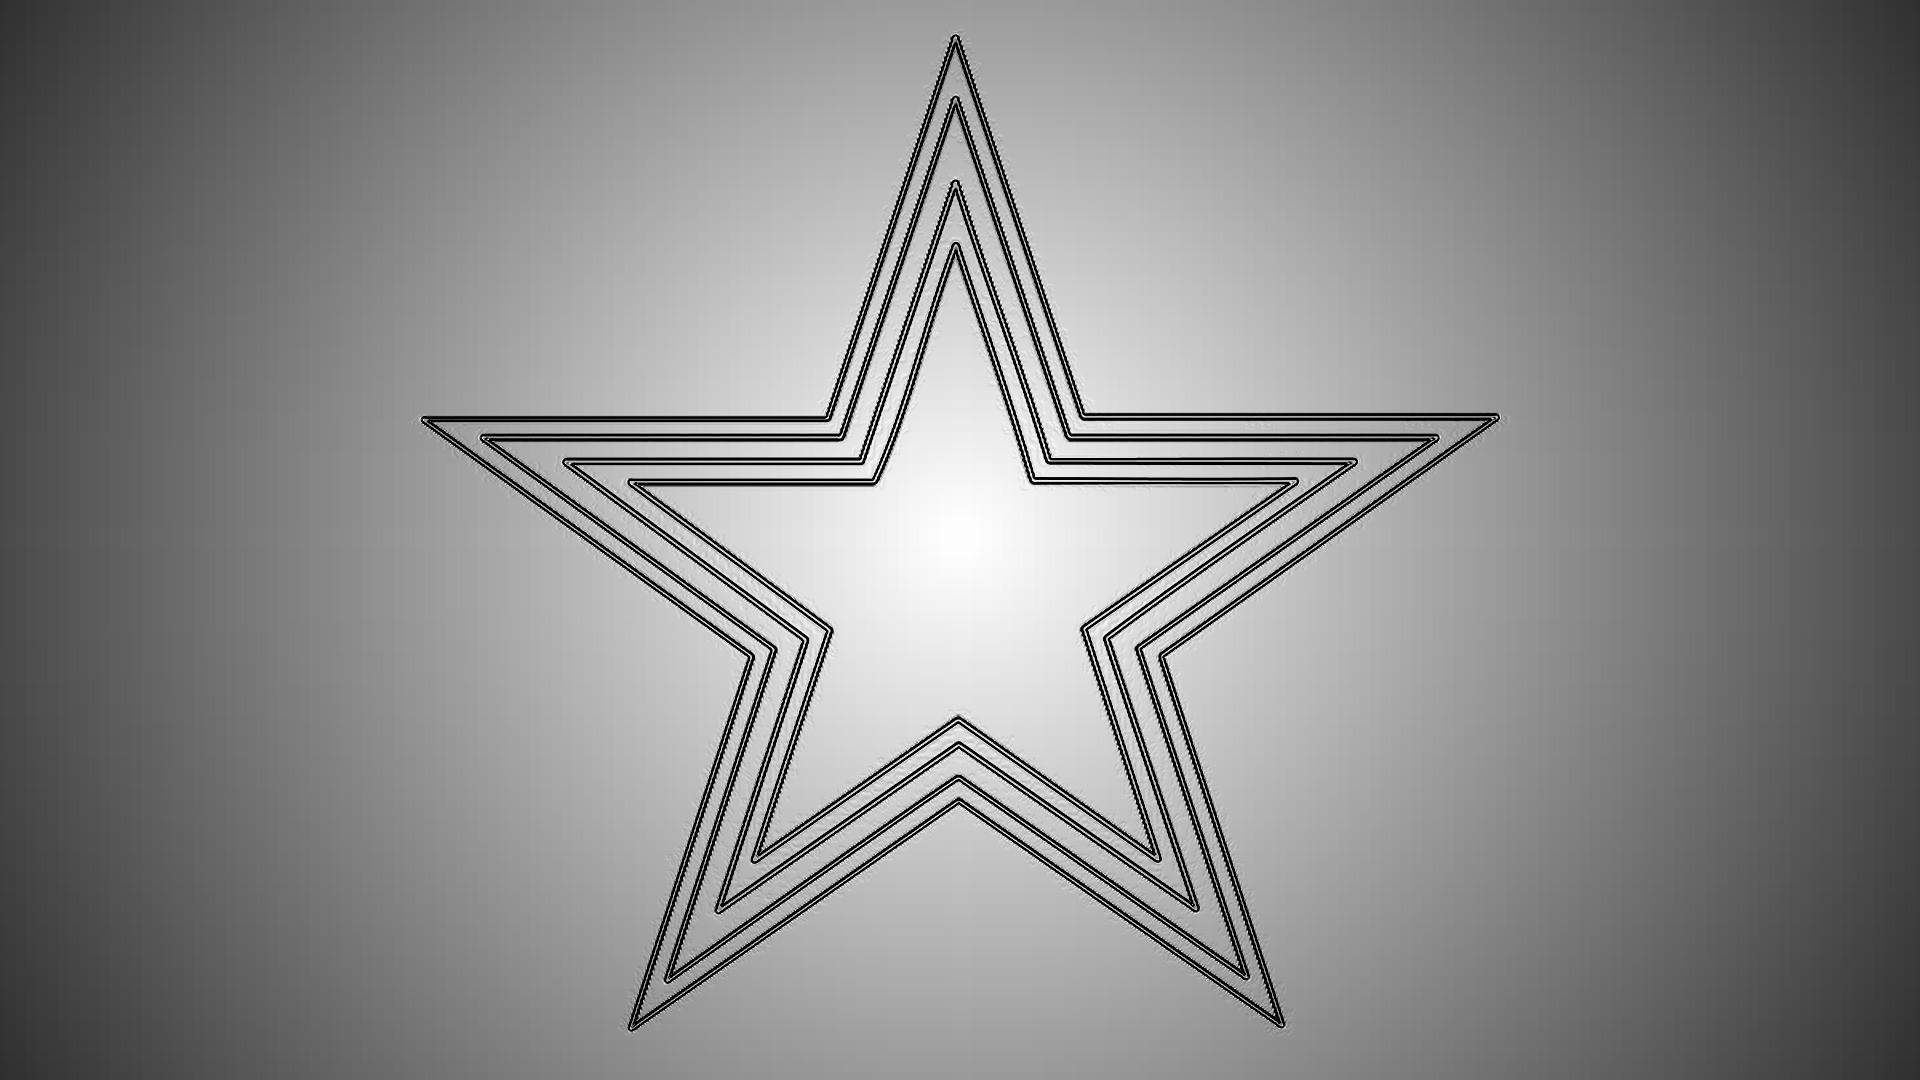 1920x1080 Hd Wallpaper Dallas Cowboys For Desktop Background 1136x640PX